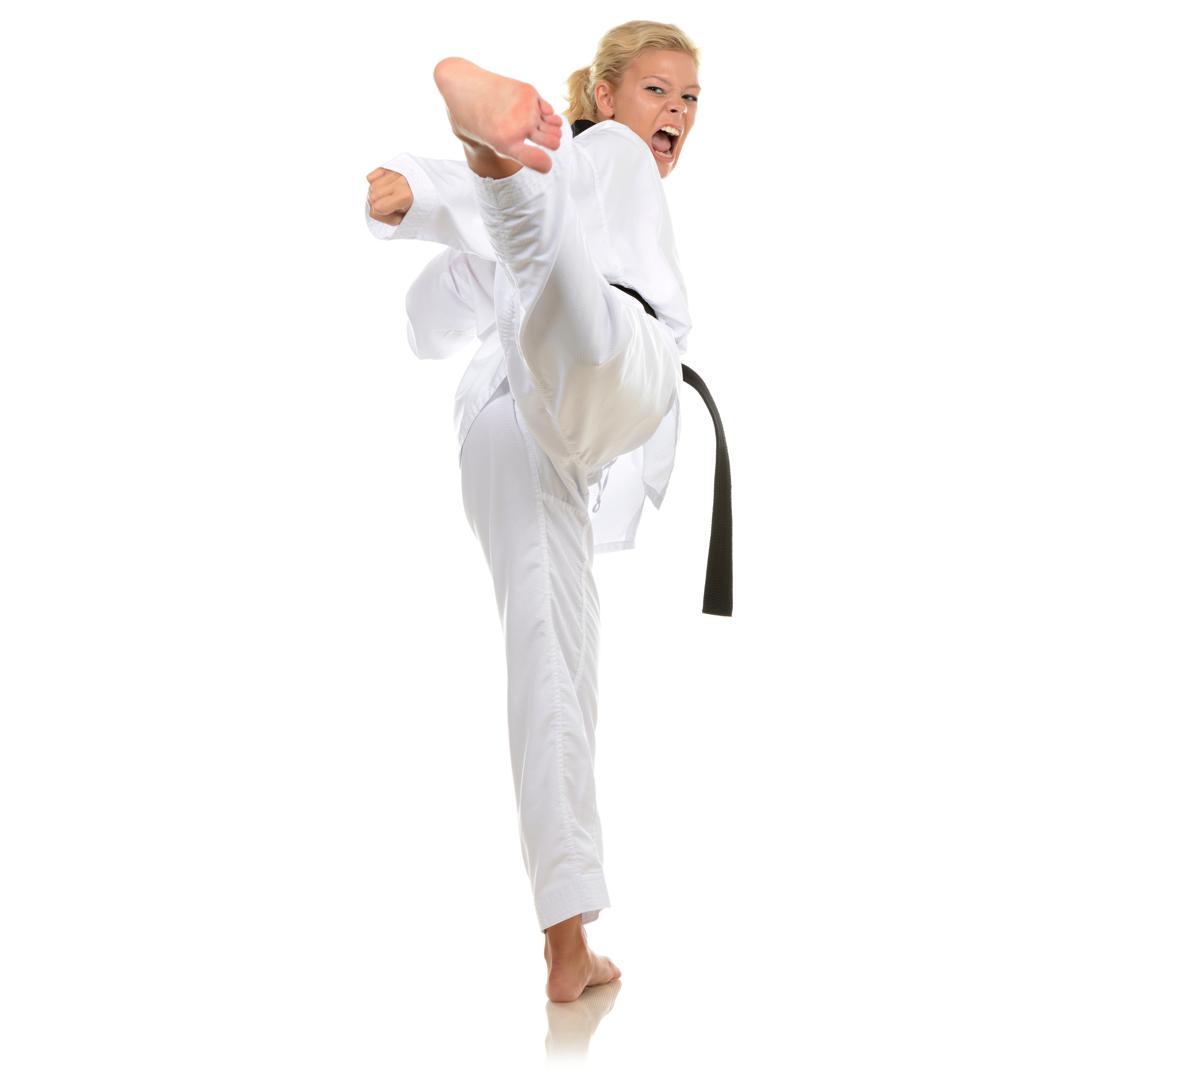 Basic Moves That Every Student Of Taekwondo Should Know